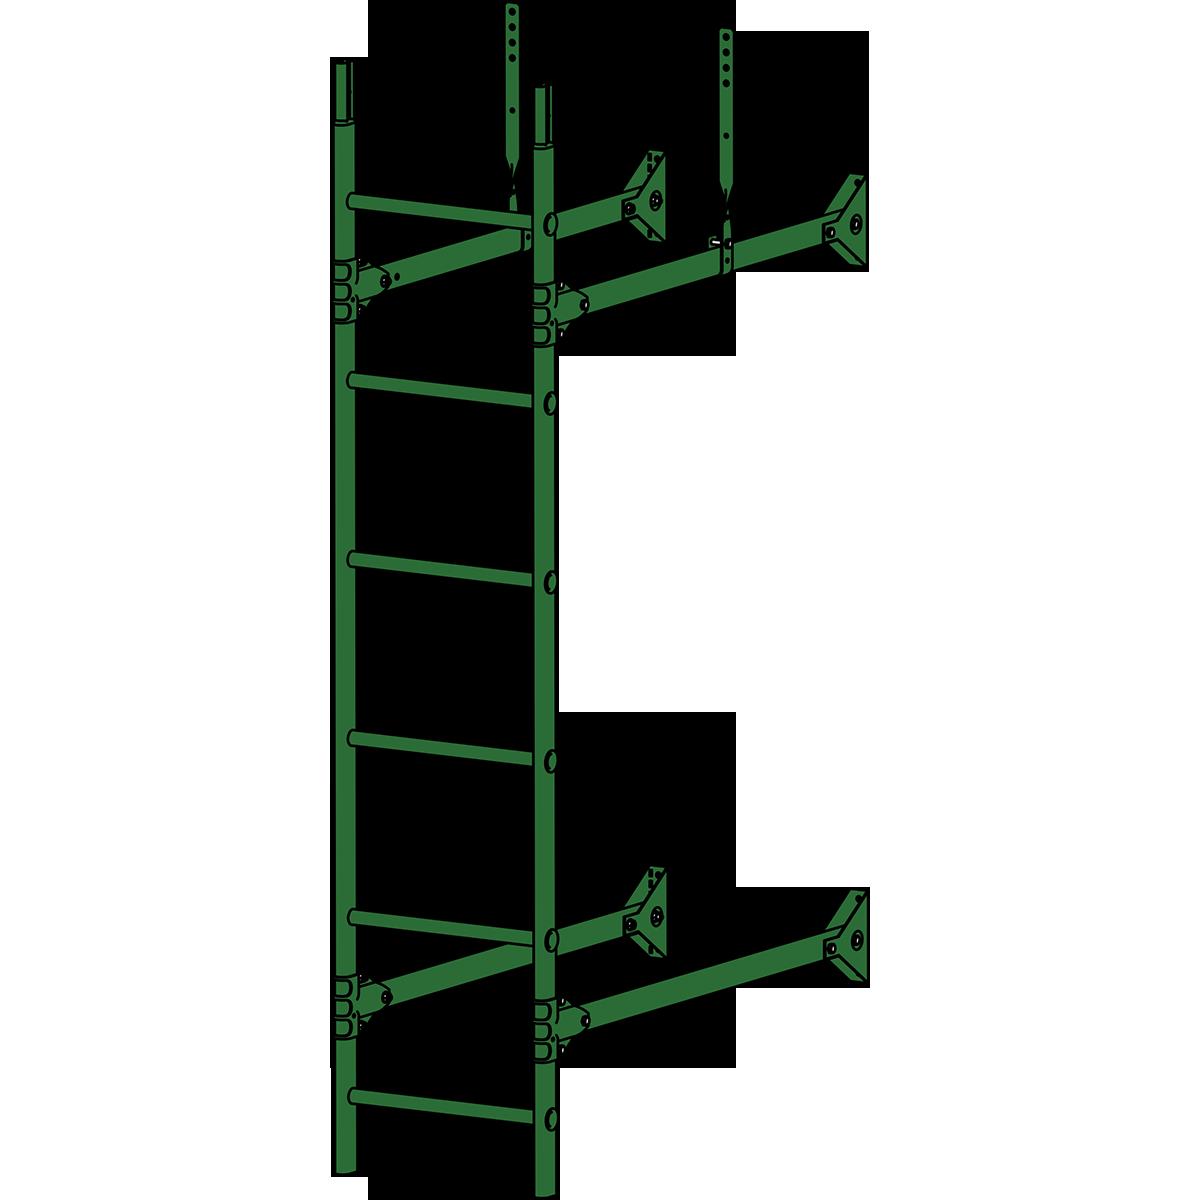 Лестница стеновая ROOFSYSTEMS PRESTIGE ZN 3м RAL 6002 Зеленый лист